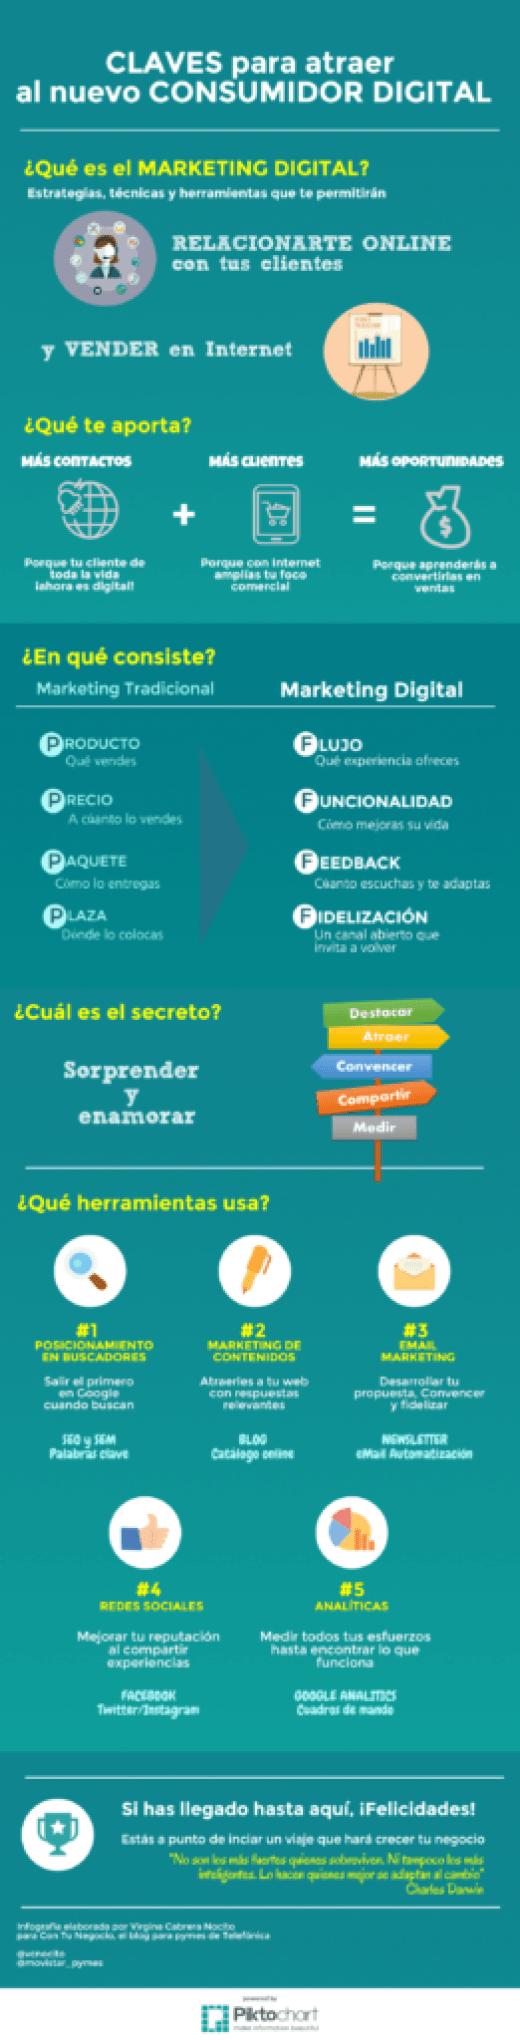 claves-para-atraer-al-nuevo-consumidor-digital-infografia